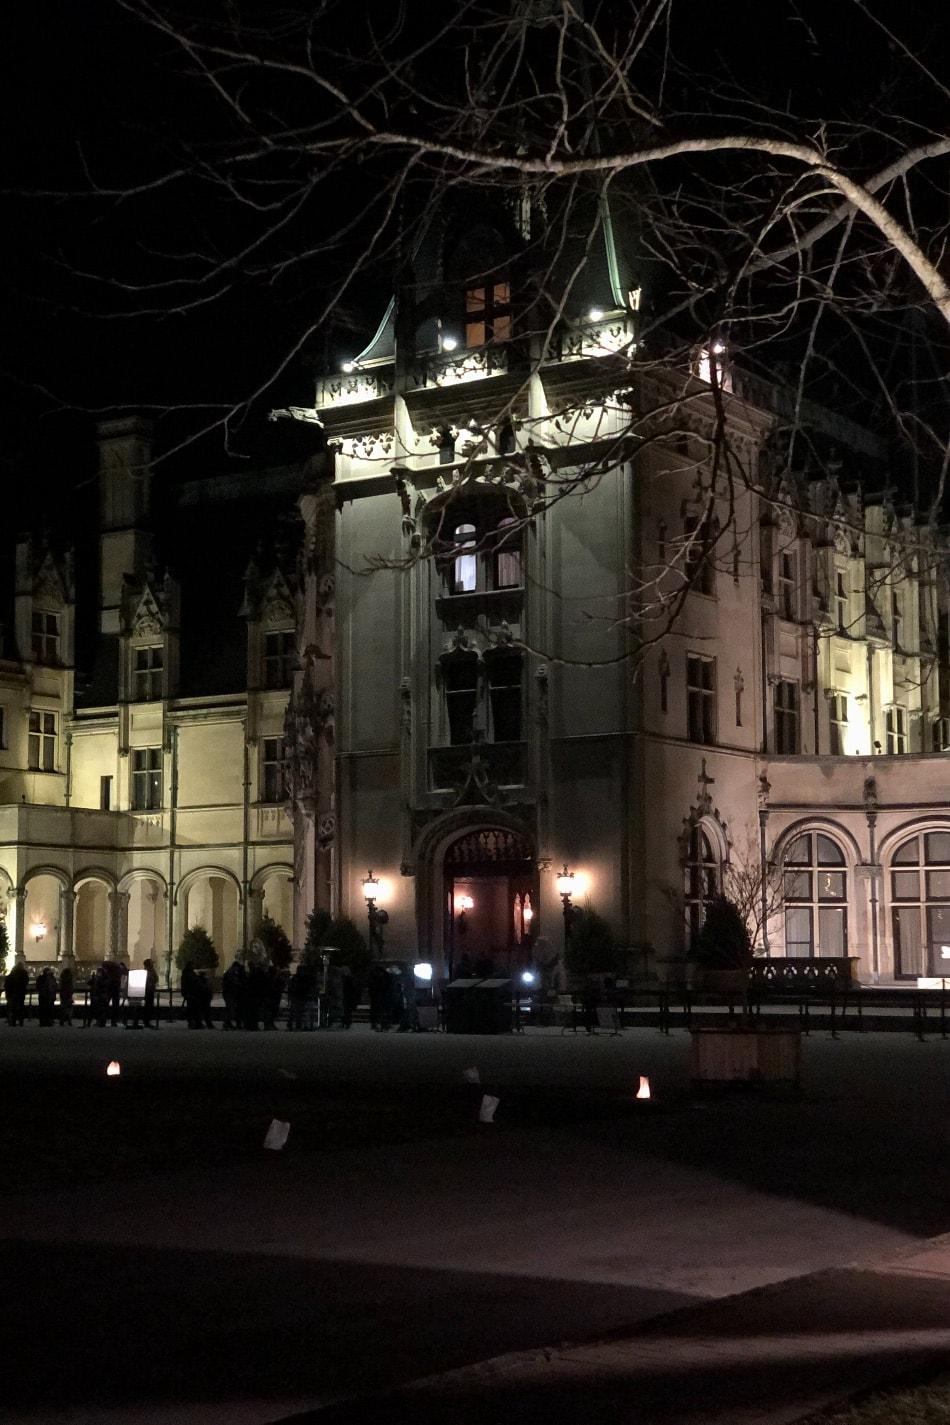 Biltmore House at night